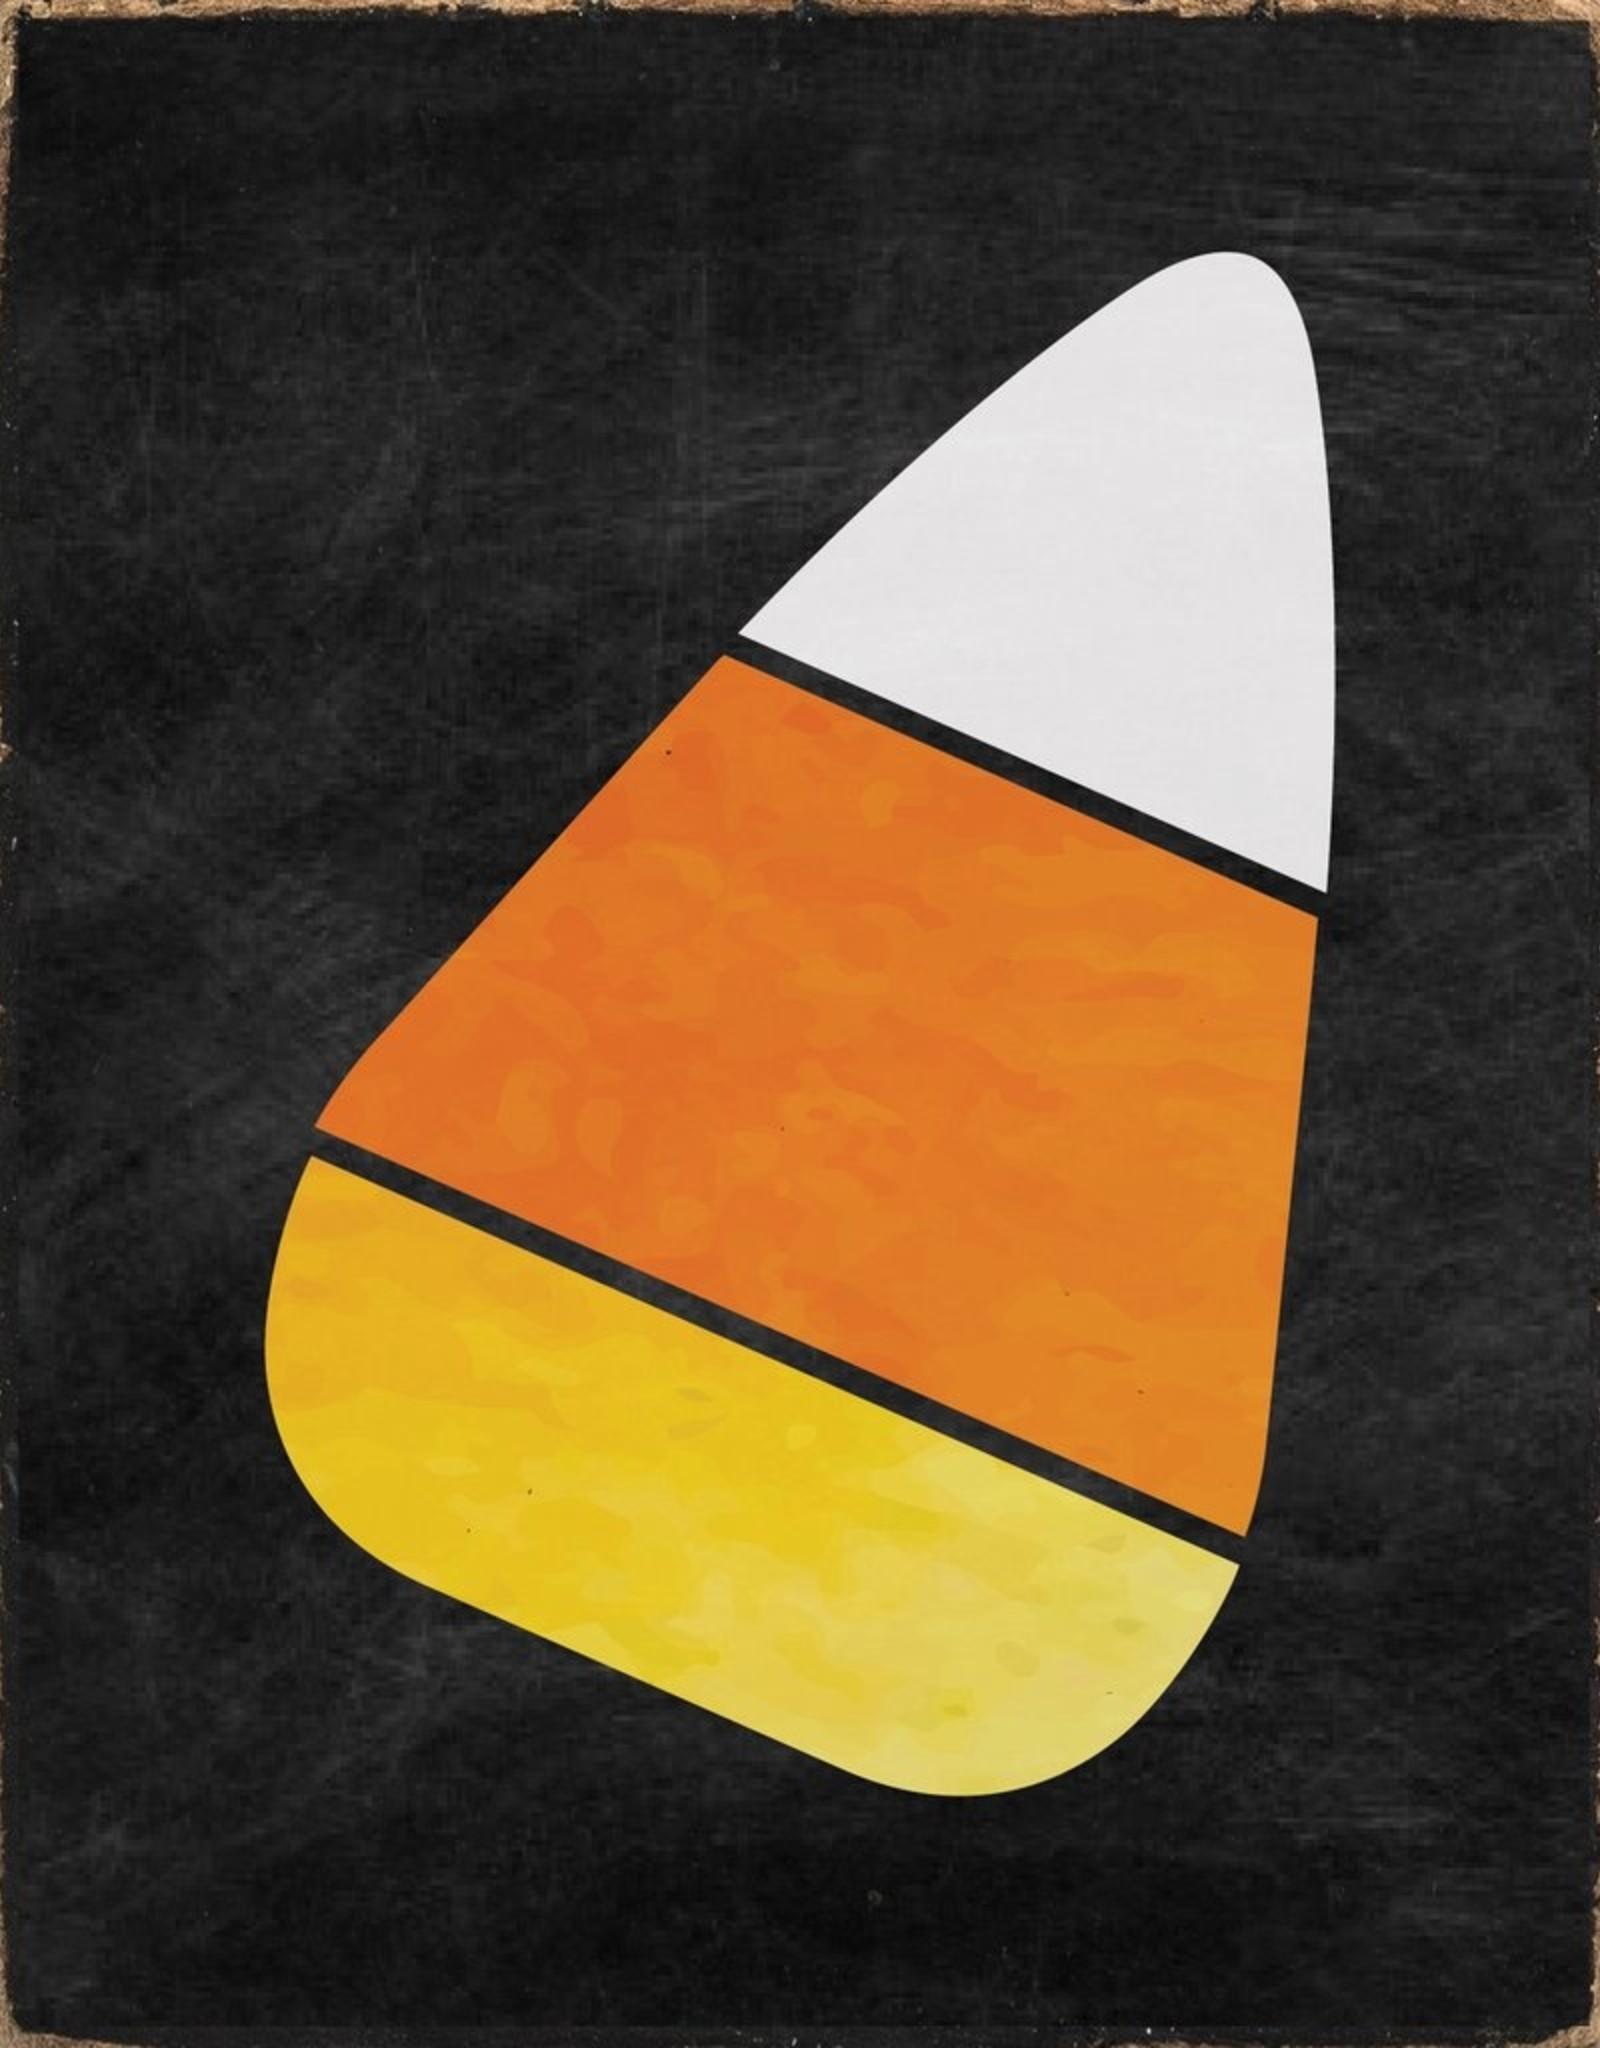 Rustic Marlin Rustic Marlin - Symbol Blocks Candy Corn Black